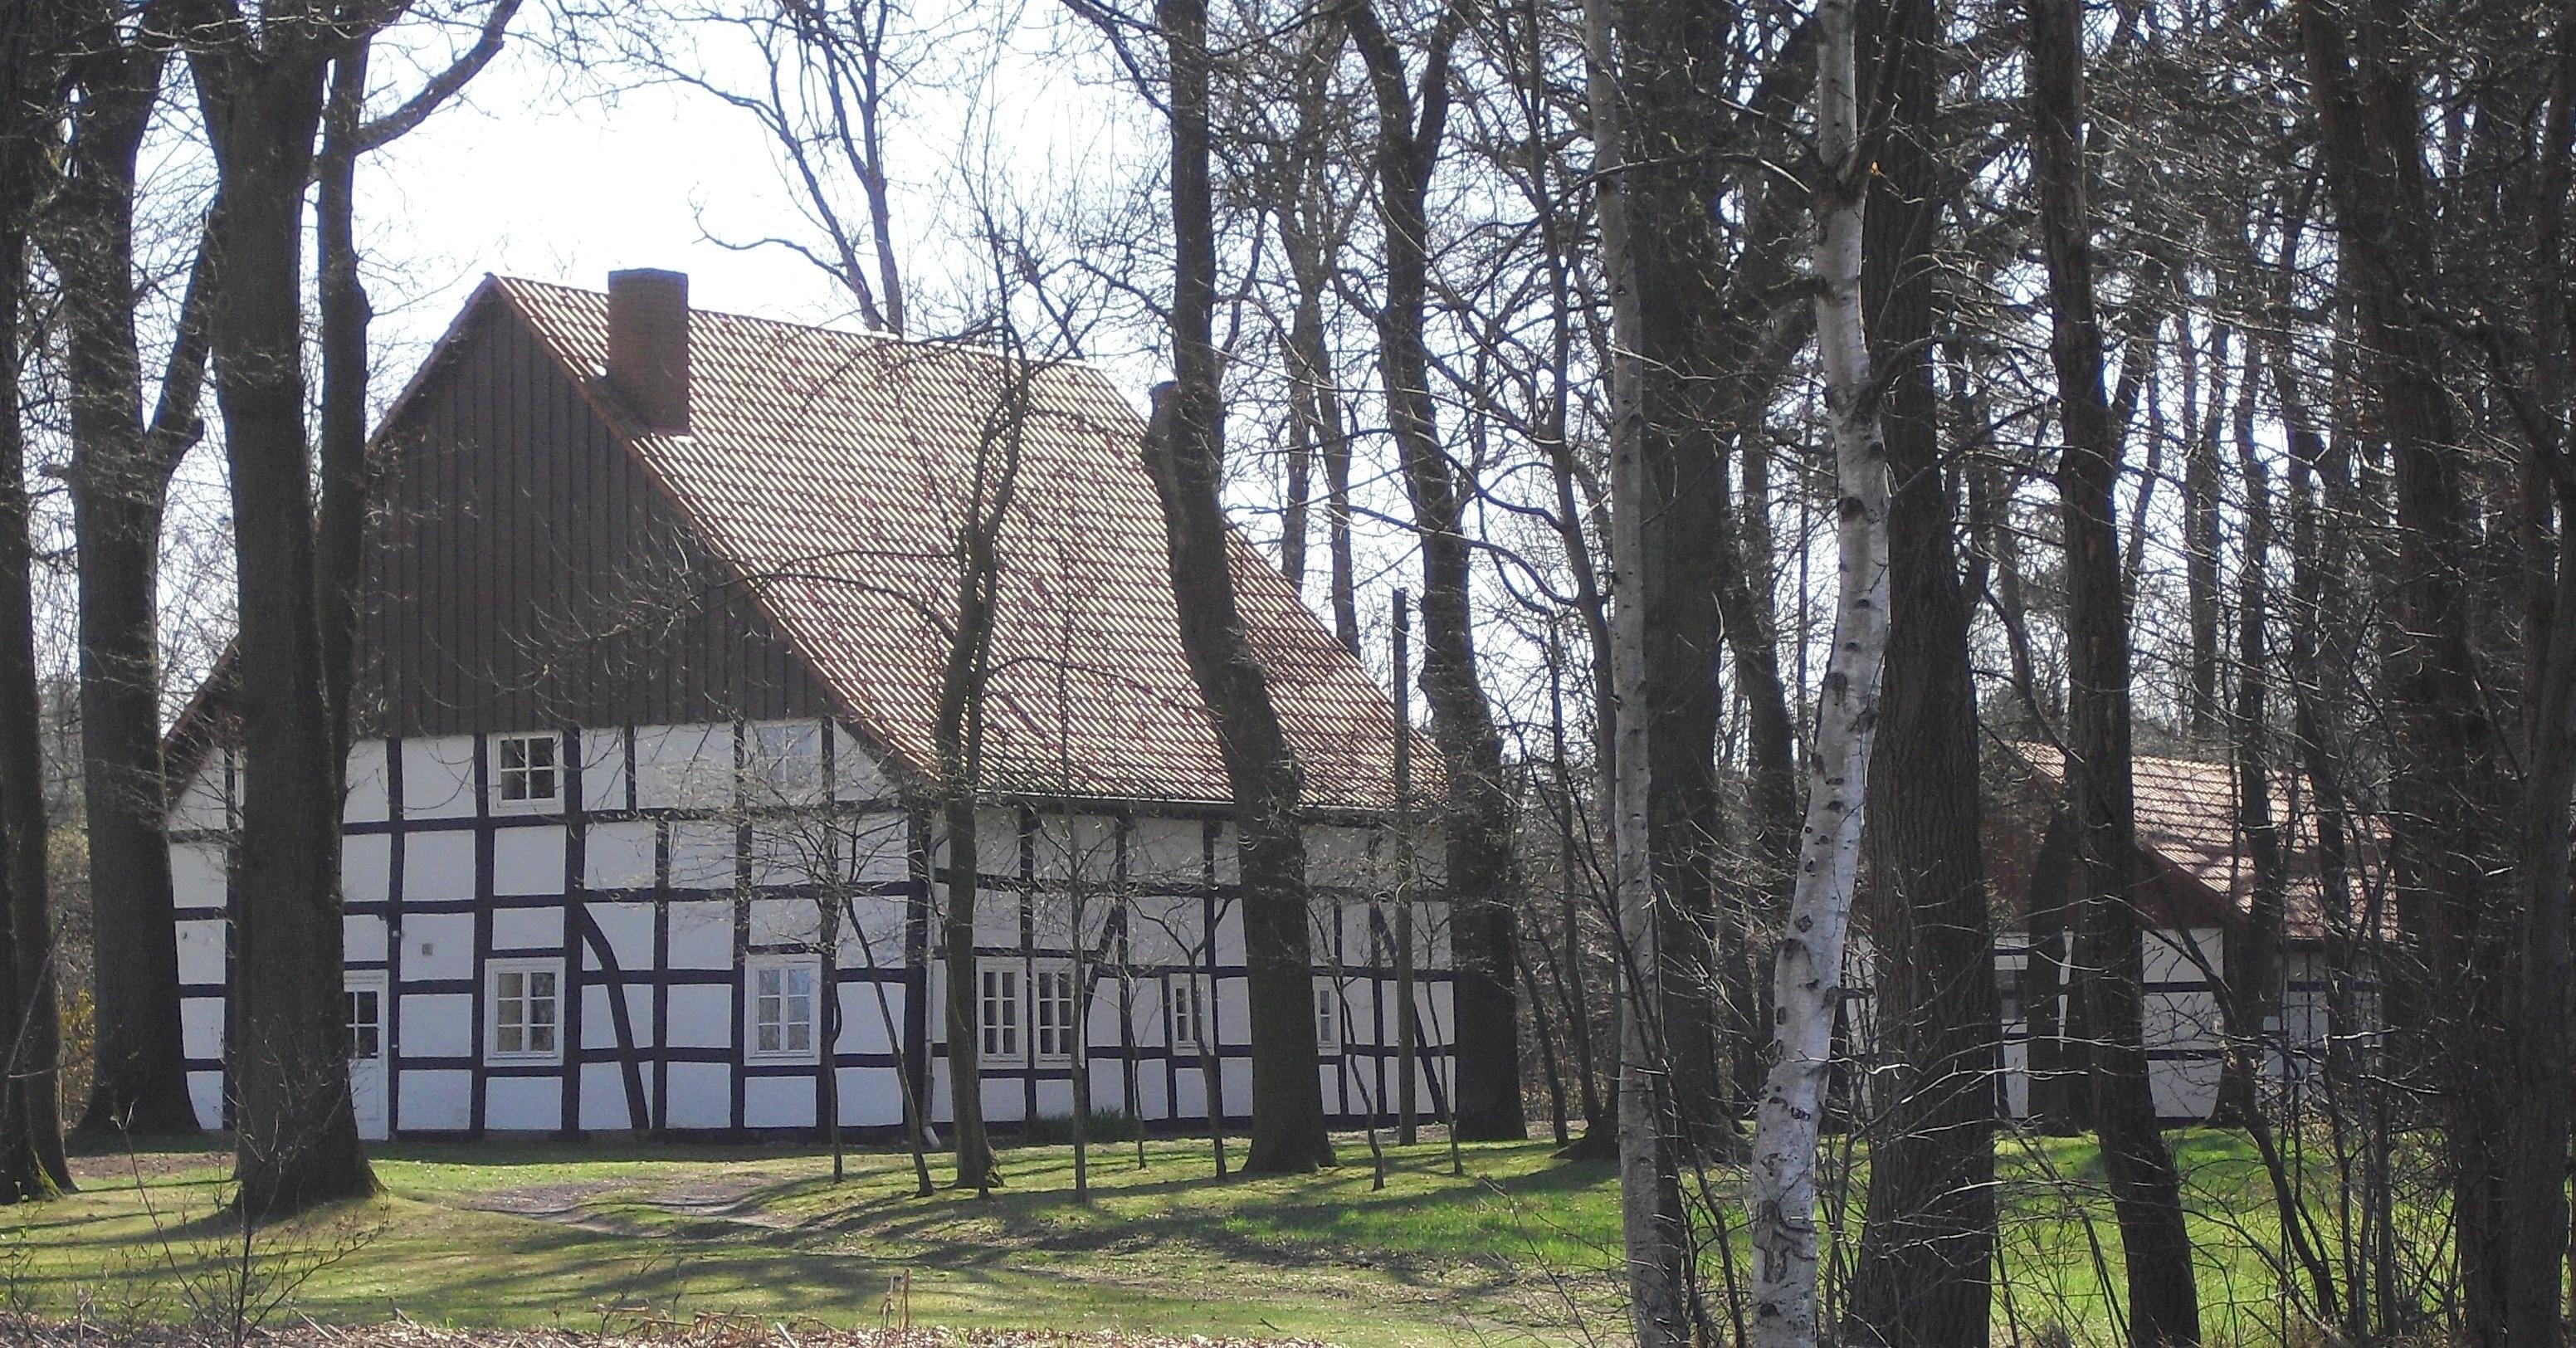 Hoevelhof, North Rhine-Westphalia, Germany